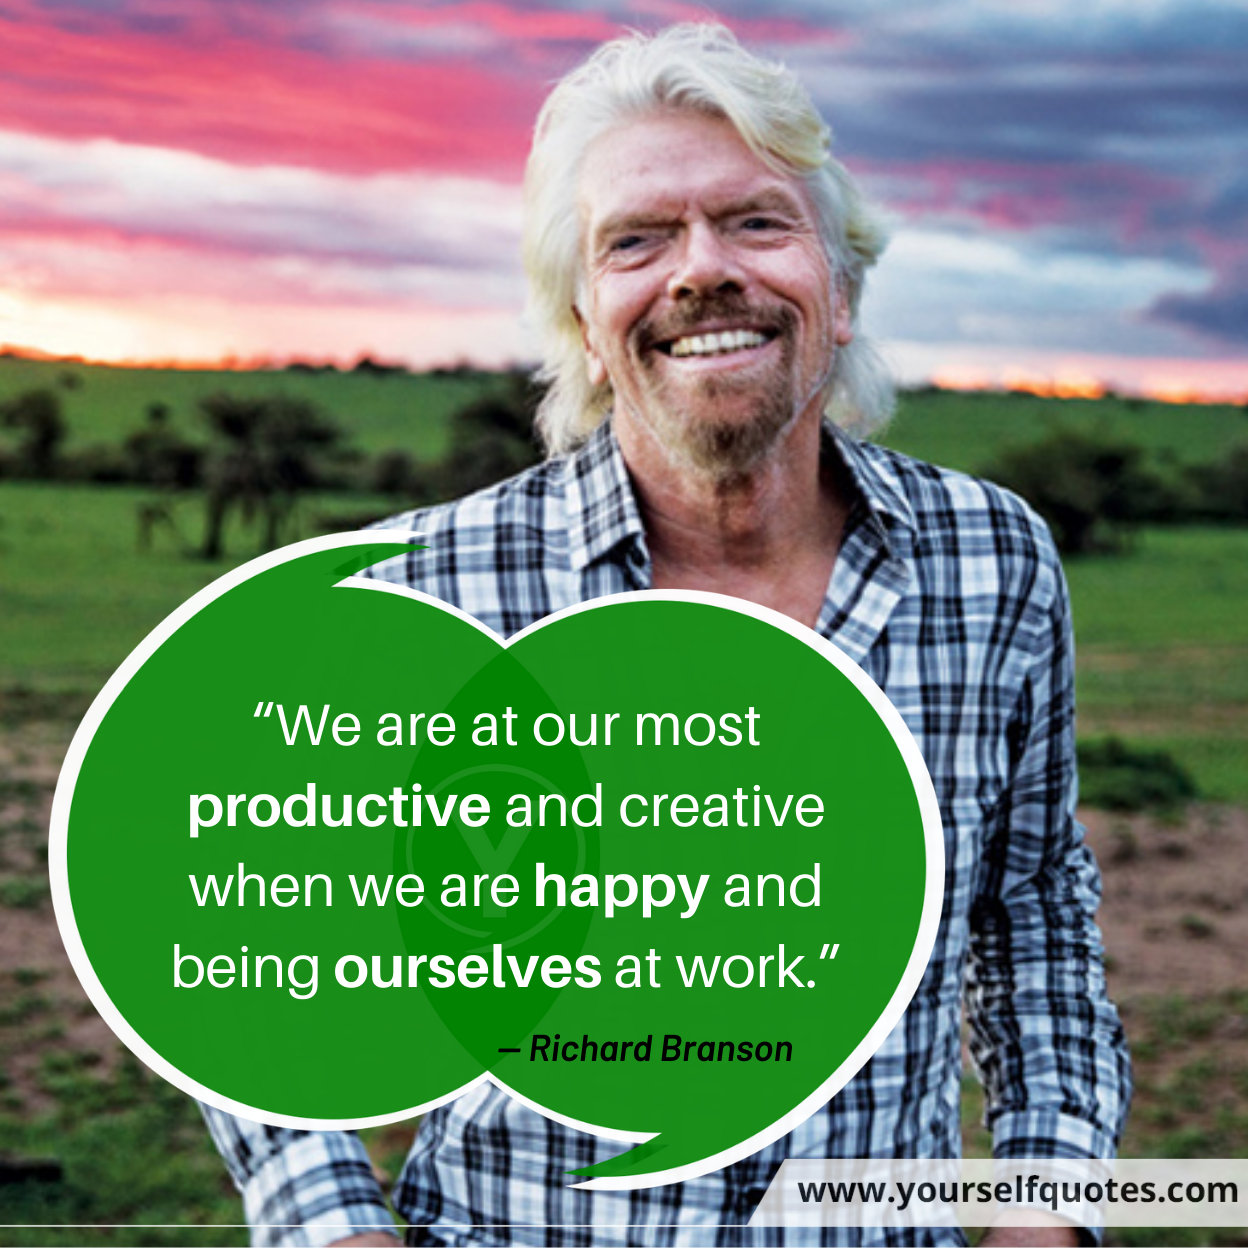 Richard Branson Motivation Quotes